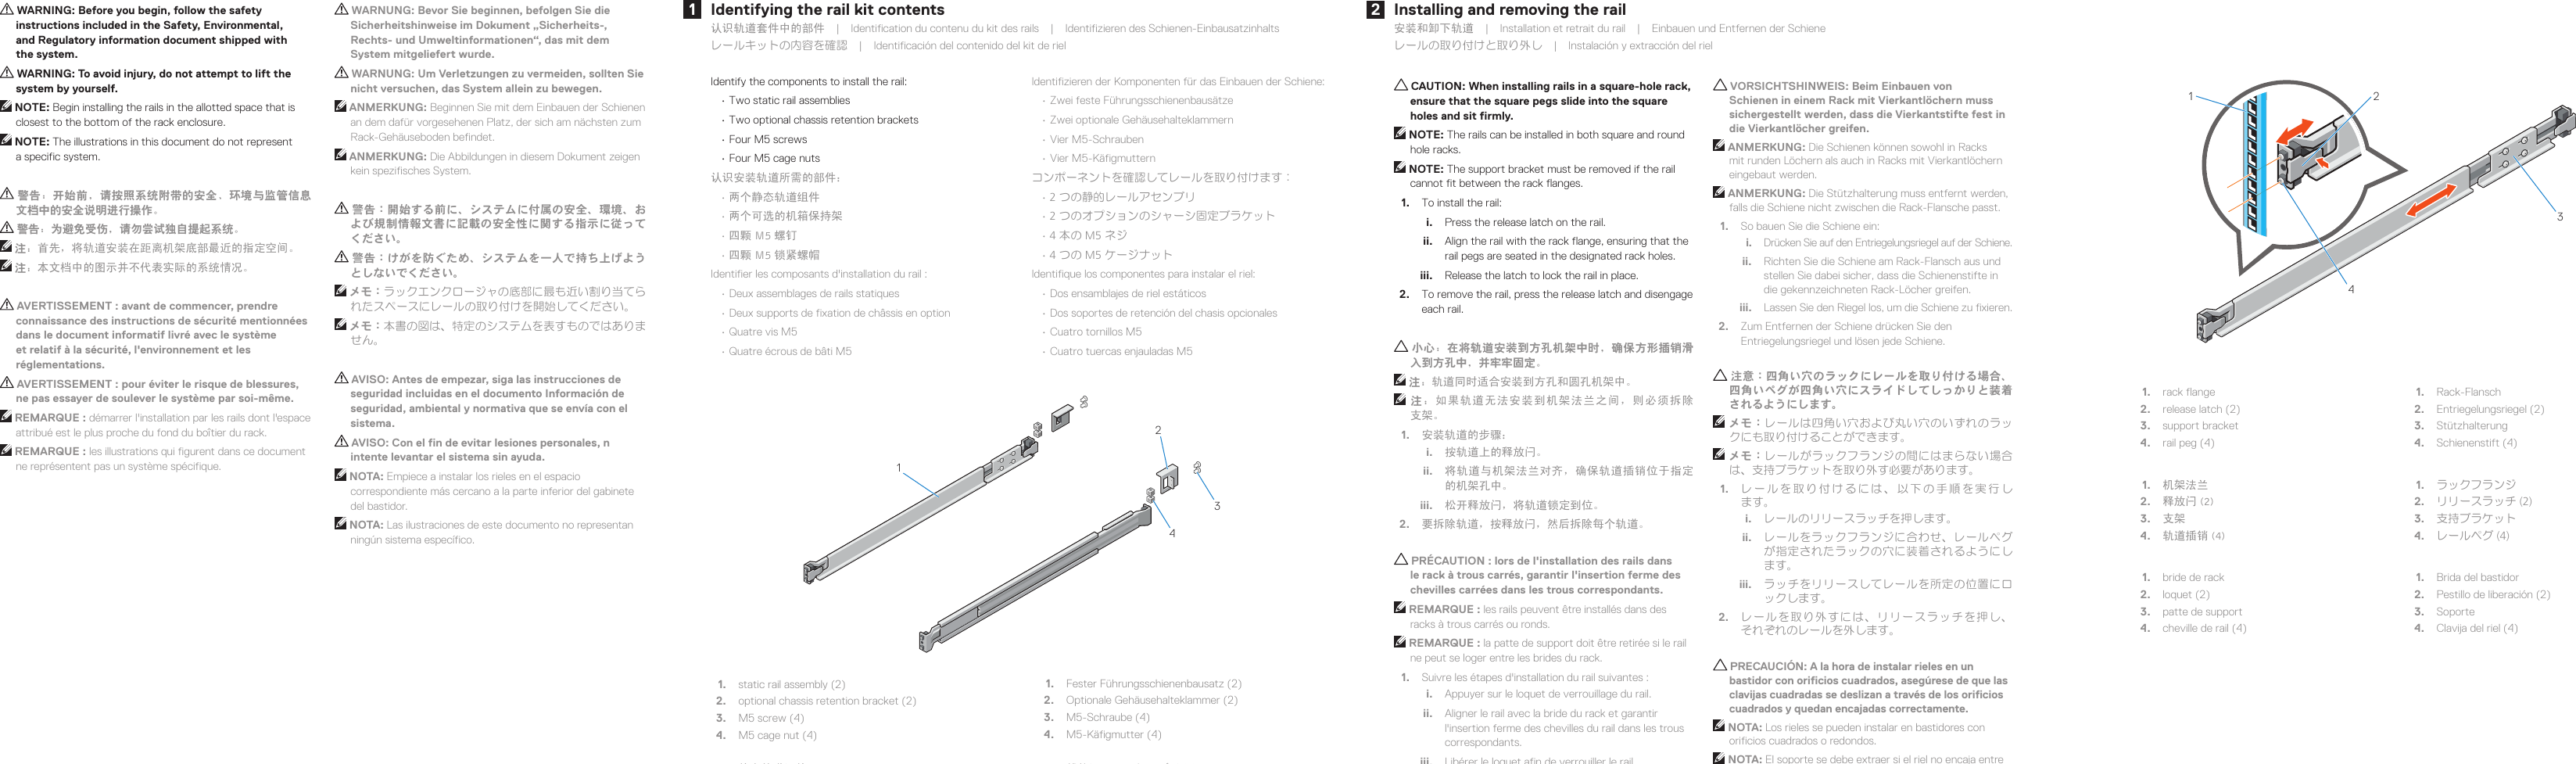 Dell Poweredge c4140 Rail Installation Guide User Manual